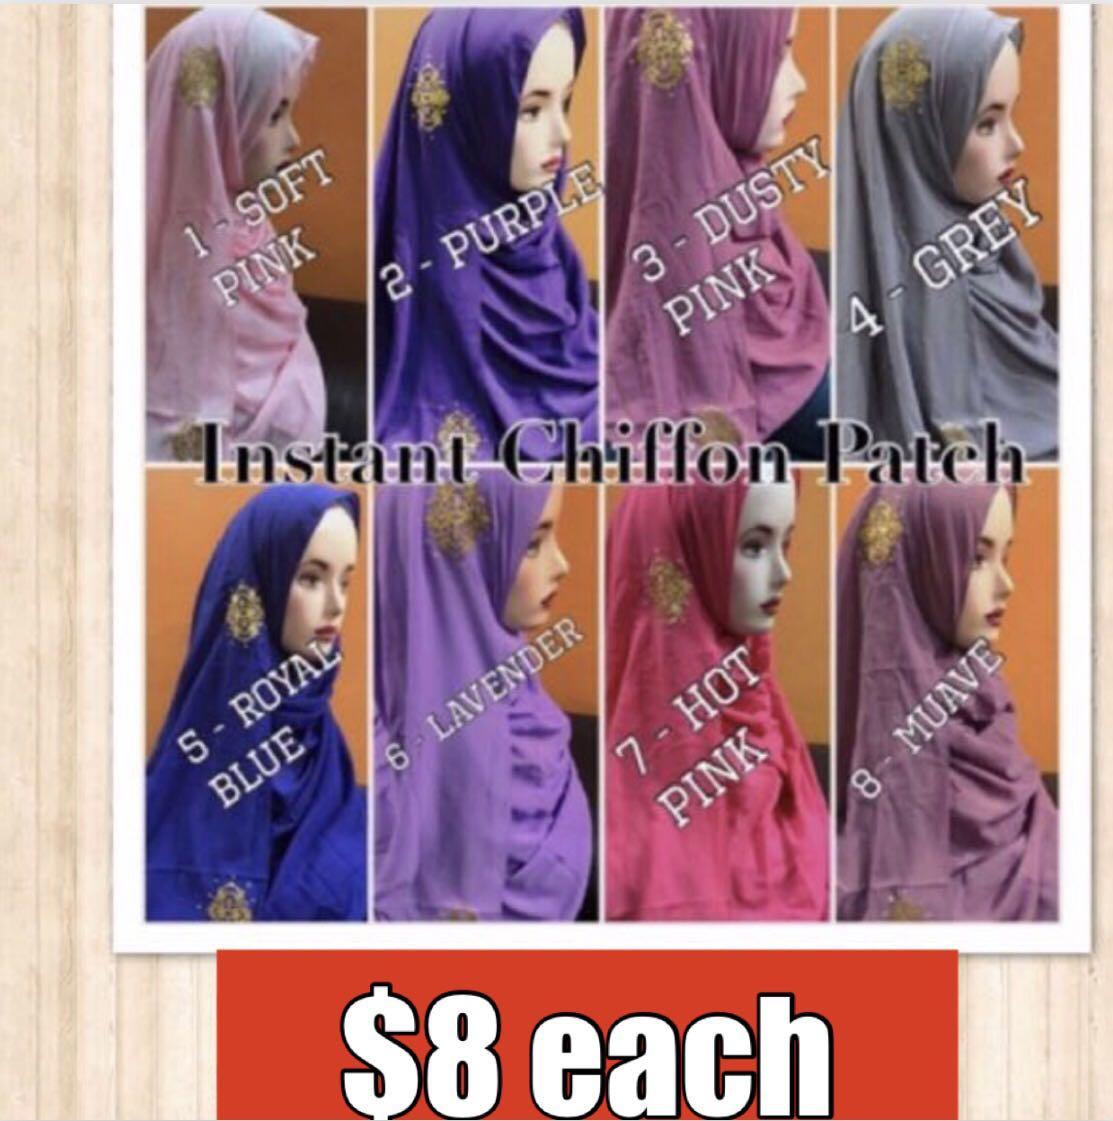 One Loop Pashmina Instan Sakura Series Baby Pink Daftar Harga Hijab Hana 1 Instant Chiffon Patch Shawl Womens Fashion Muslimah On Carousell